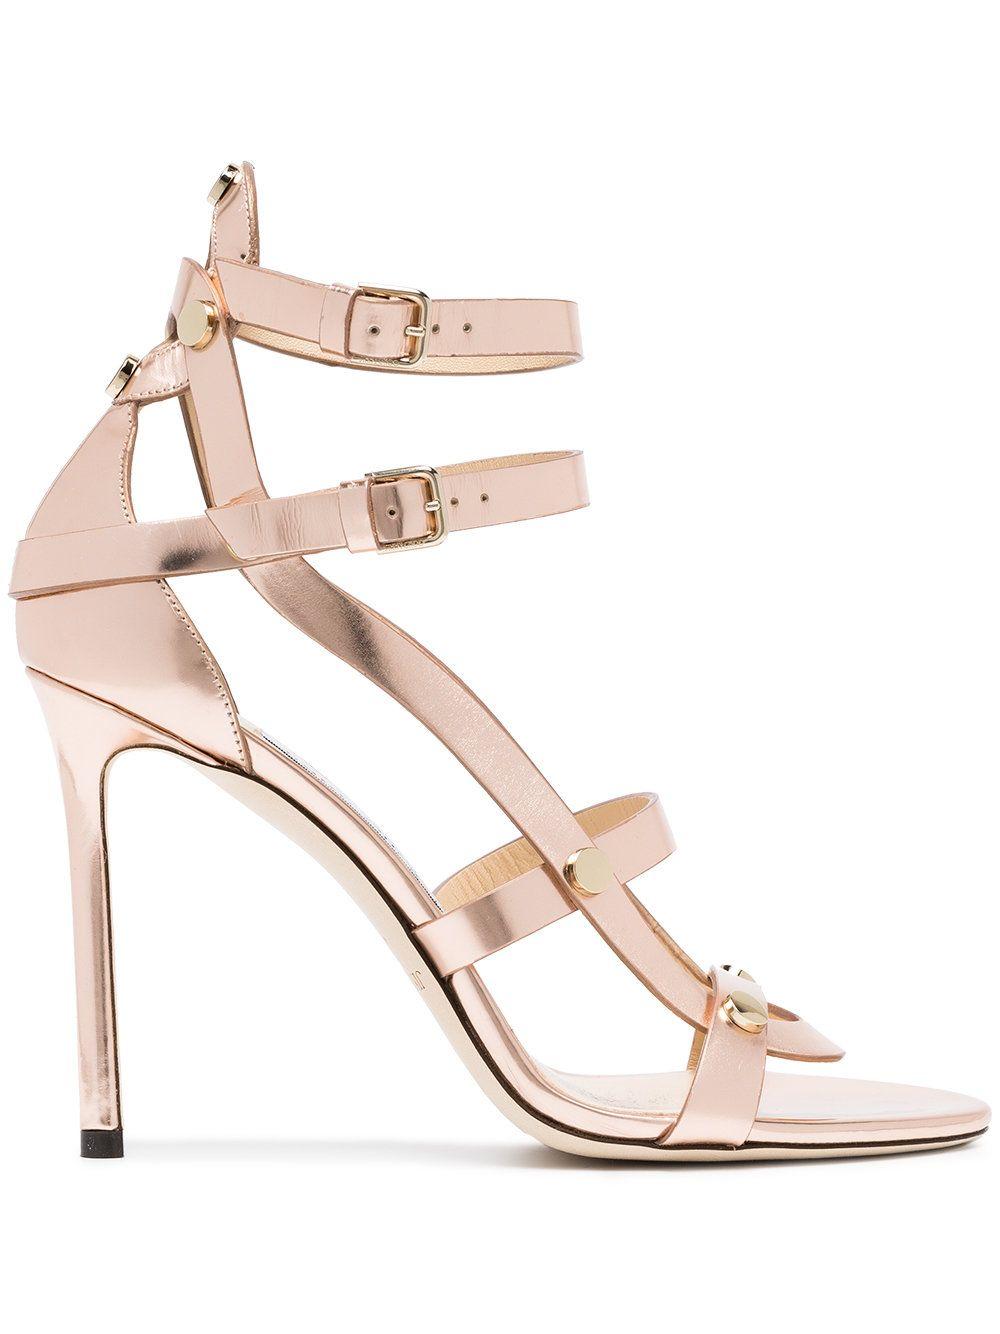 0ddb15240bfe Jimmy Choo Rose Gold Motoko 100 Leather Sandals